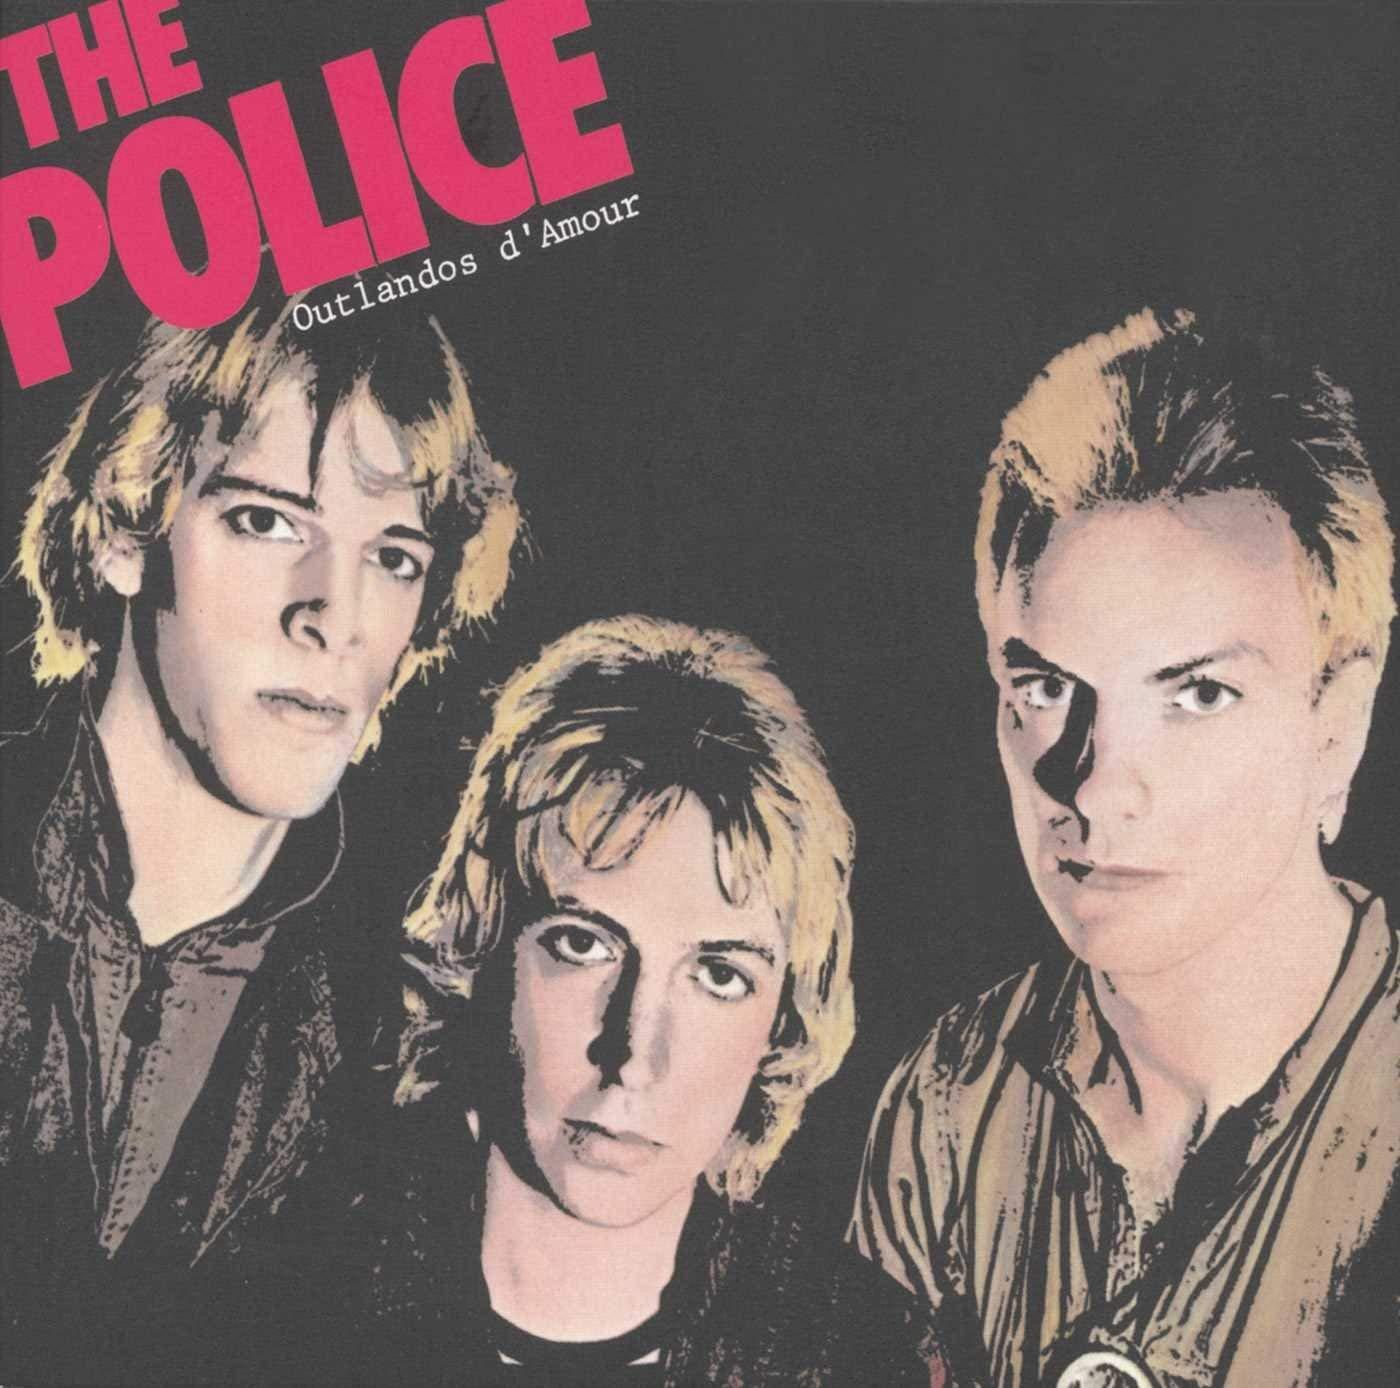 The Police - Outlandos D'Amour [VINYL] Limited Edition LP now £9.99 (Prime) + £2.99 (non Prime) at Amazon